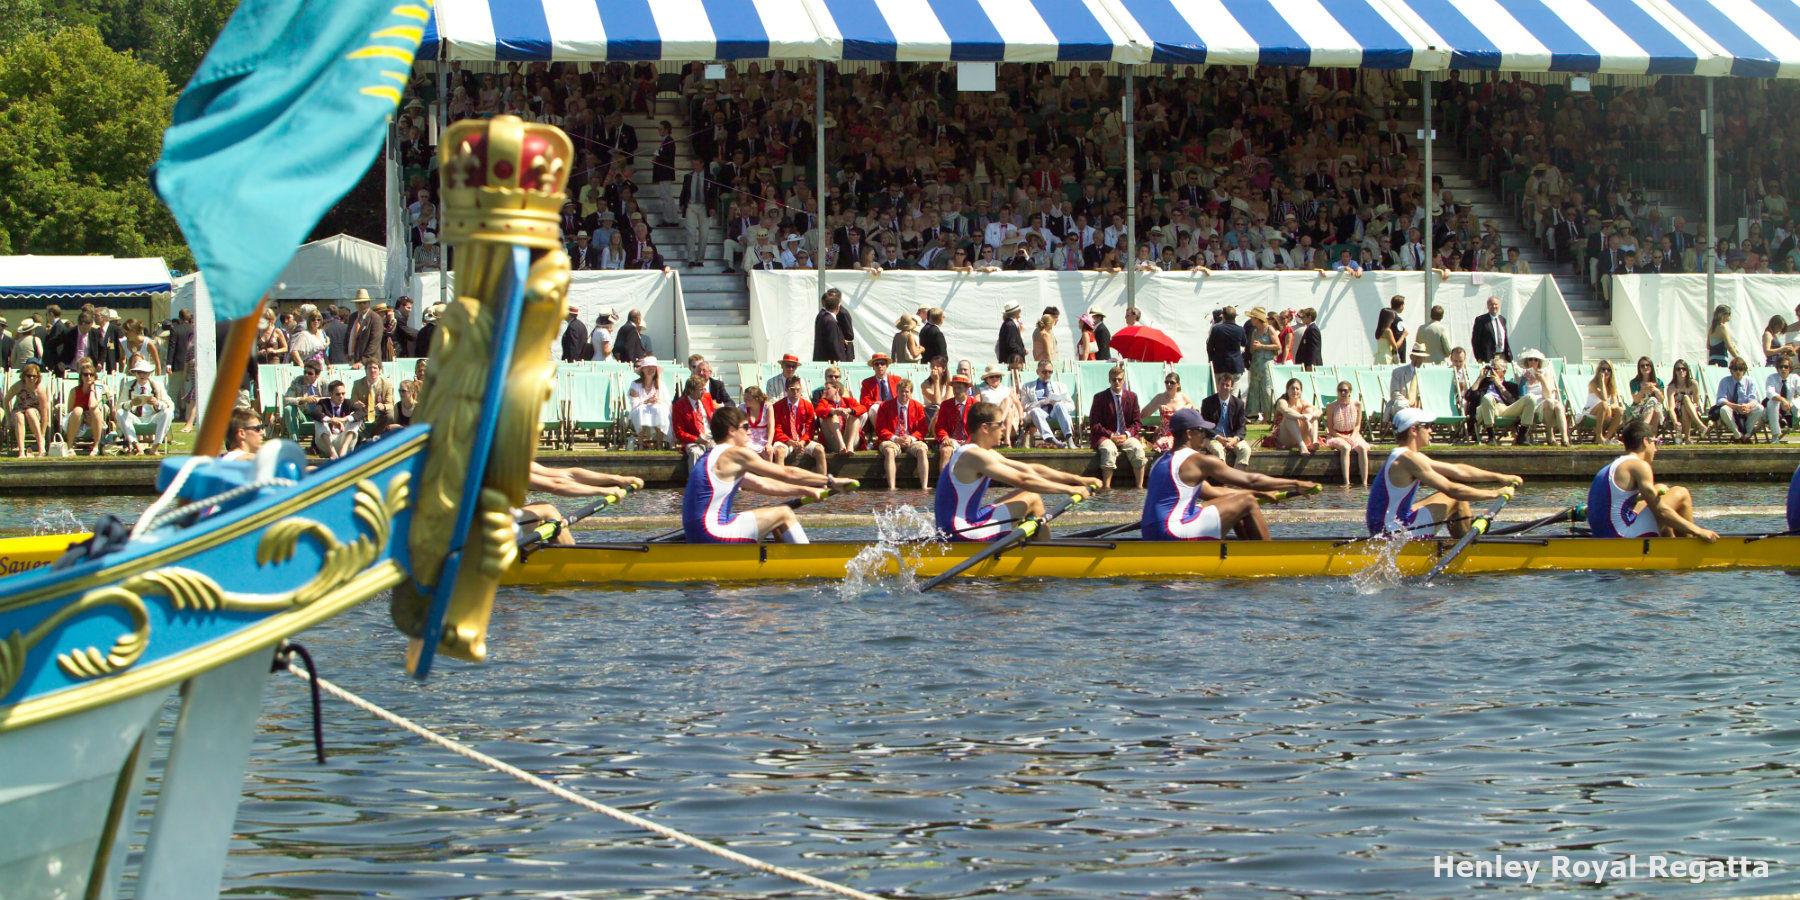 Henley Royal Regatta: Thames RC